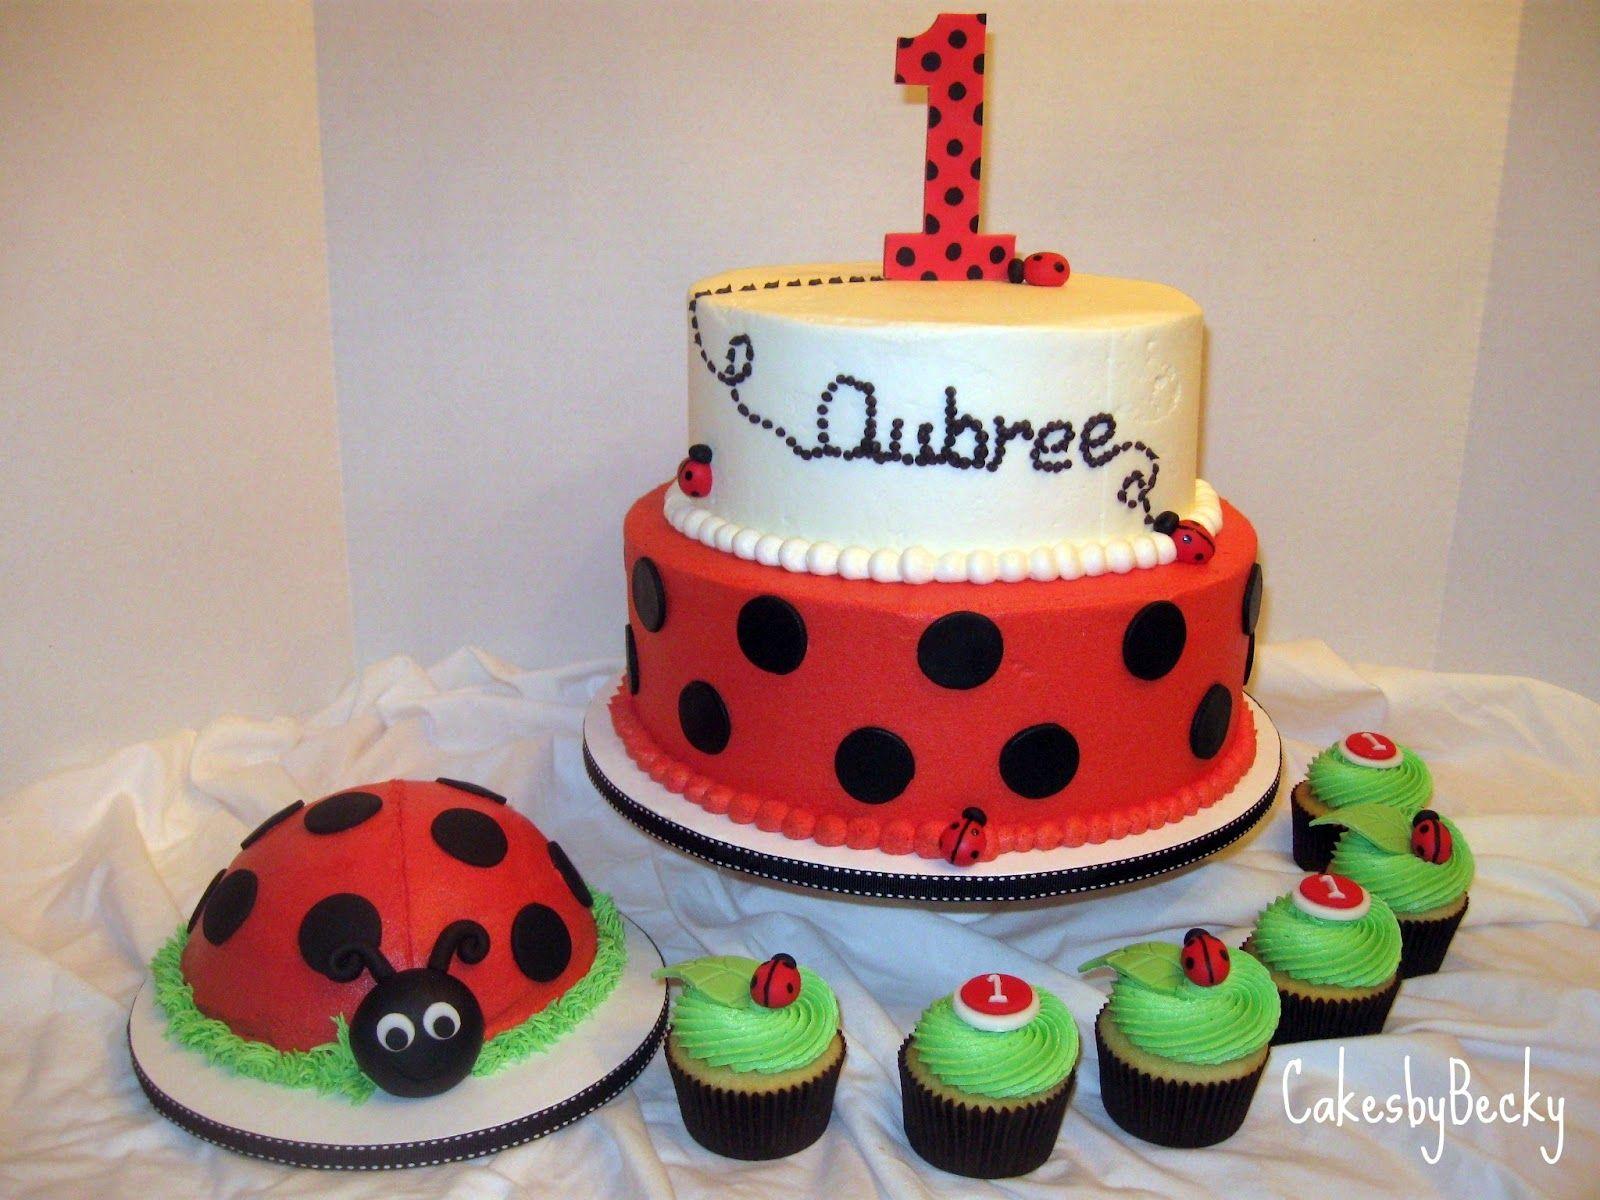 Astonishing Ladybug First Birthday Ladybug 1St Birthdays Lady Bug Birthday Personalised Birthday Cards Cominlily Jamesorg